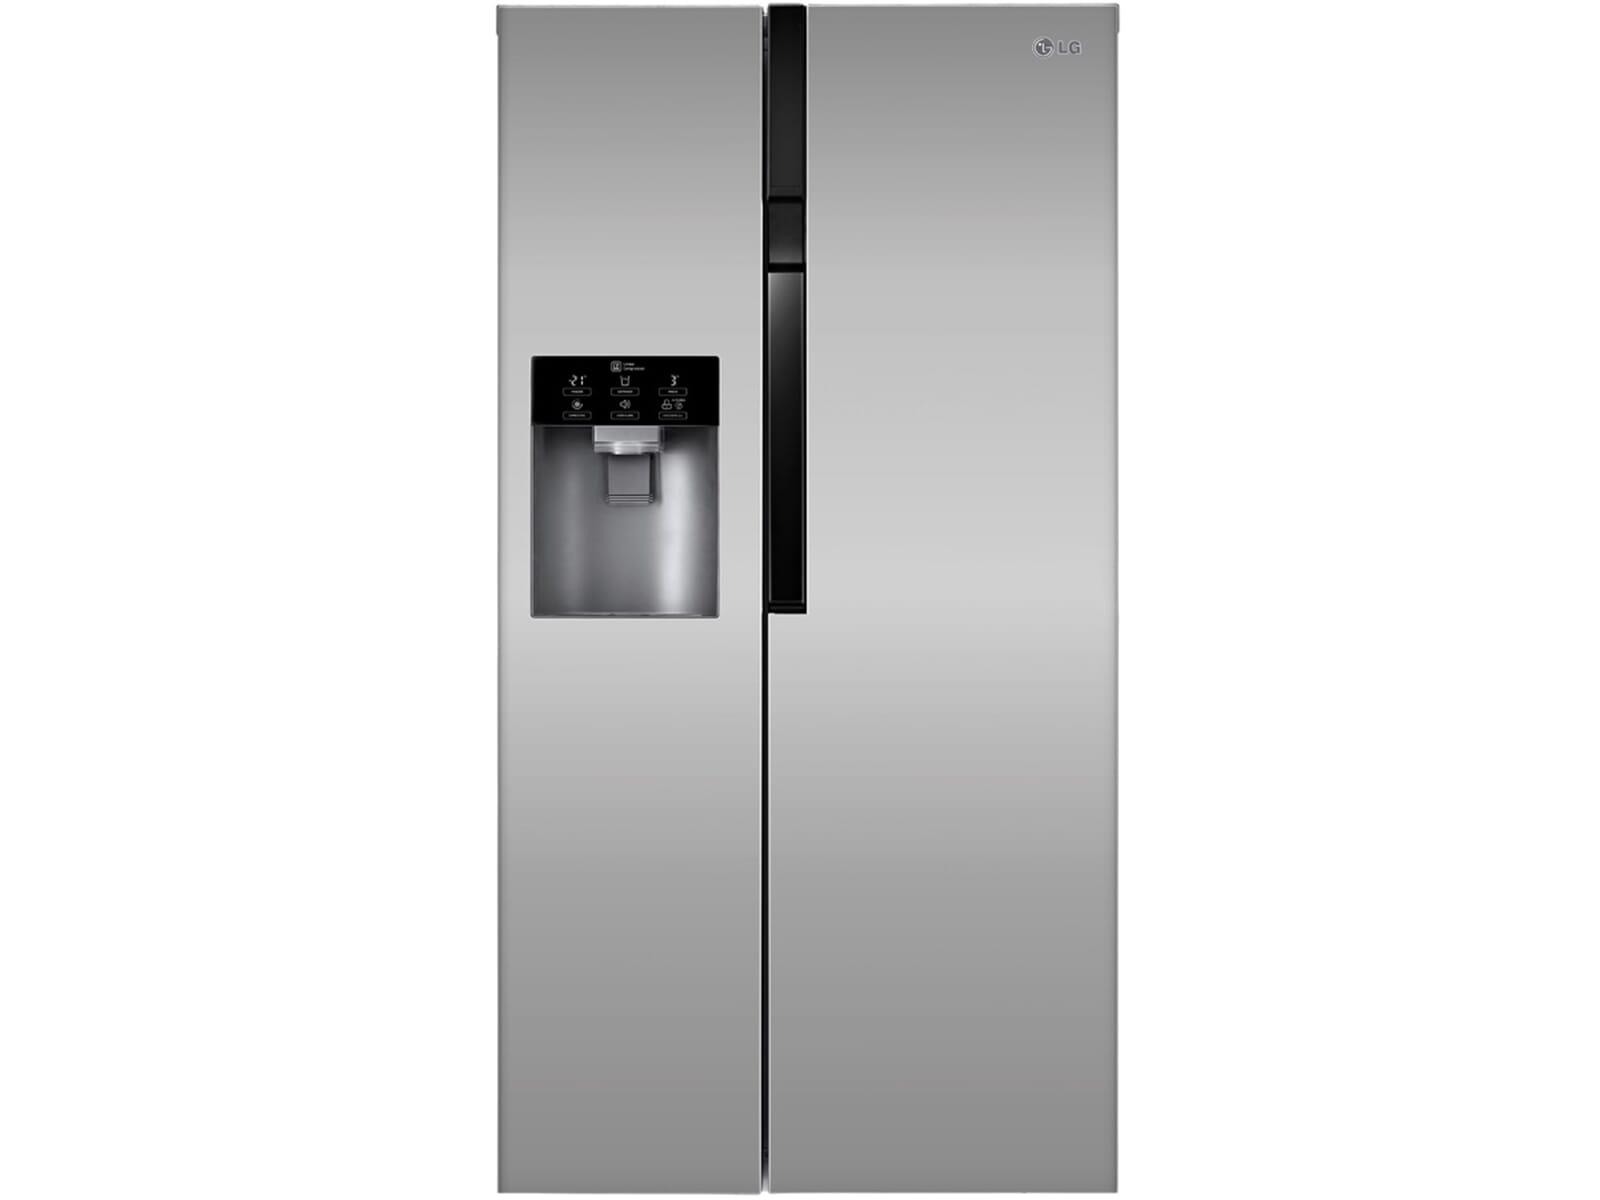 Kühlschrank Lg : Lg kühlschrank mit eiswürfelbereiter lg gsj didv side by